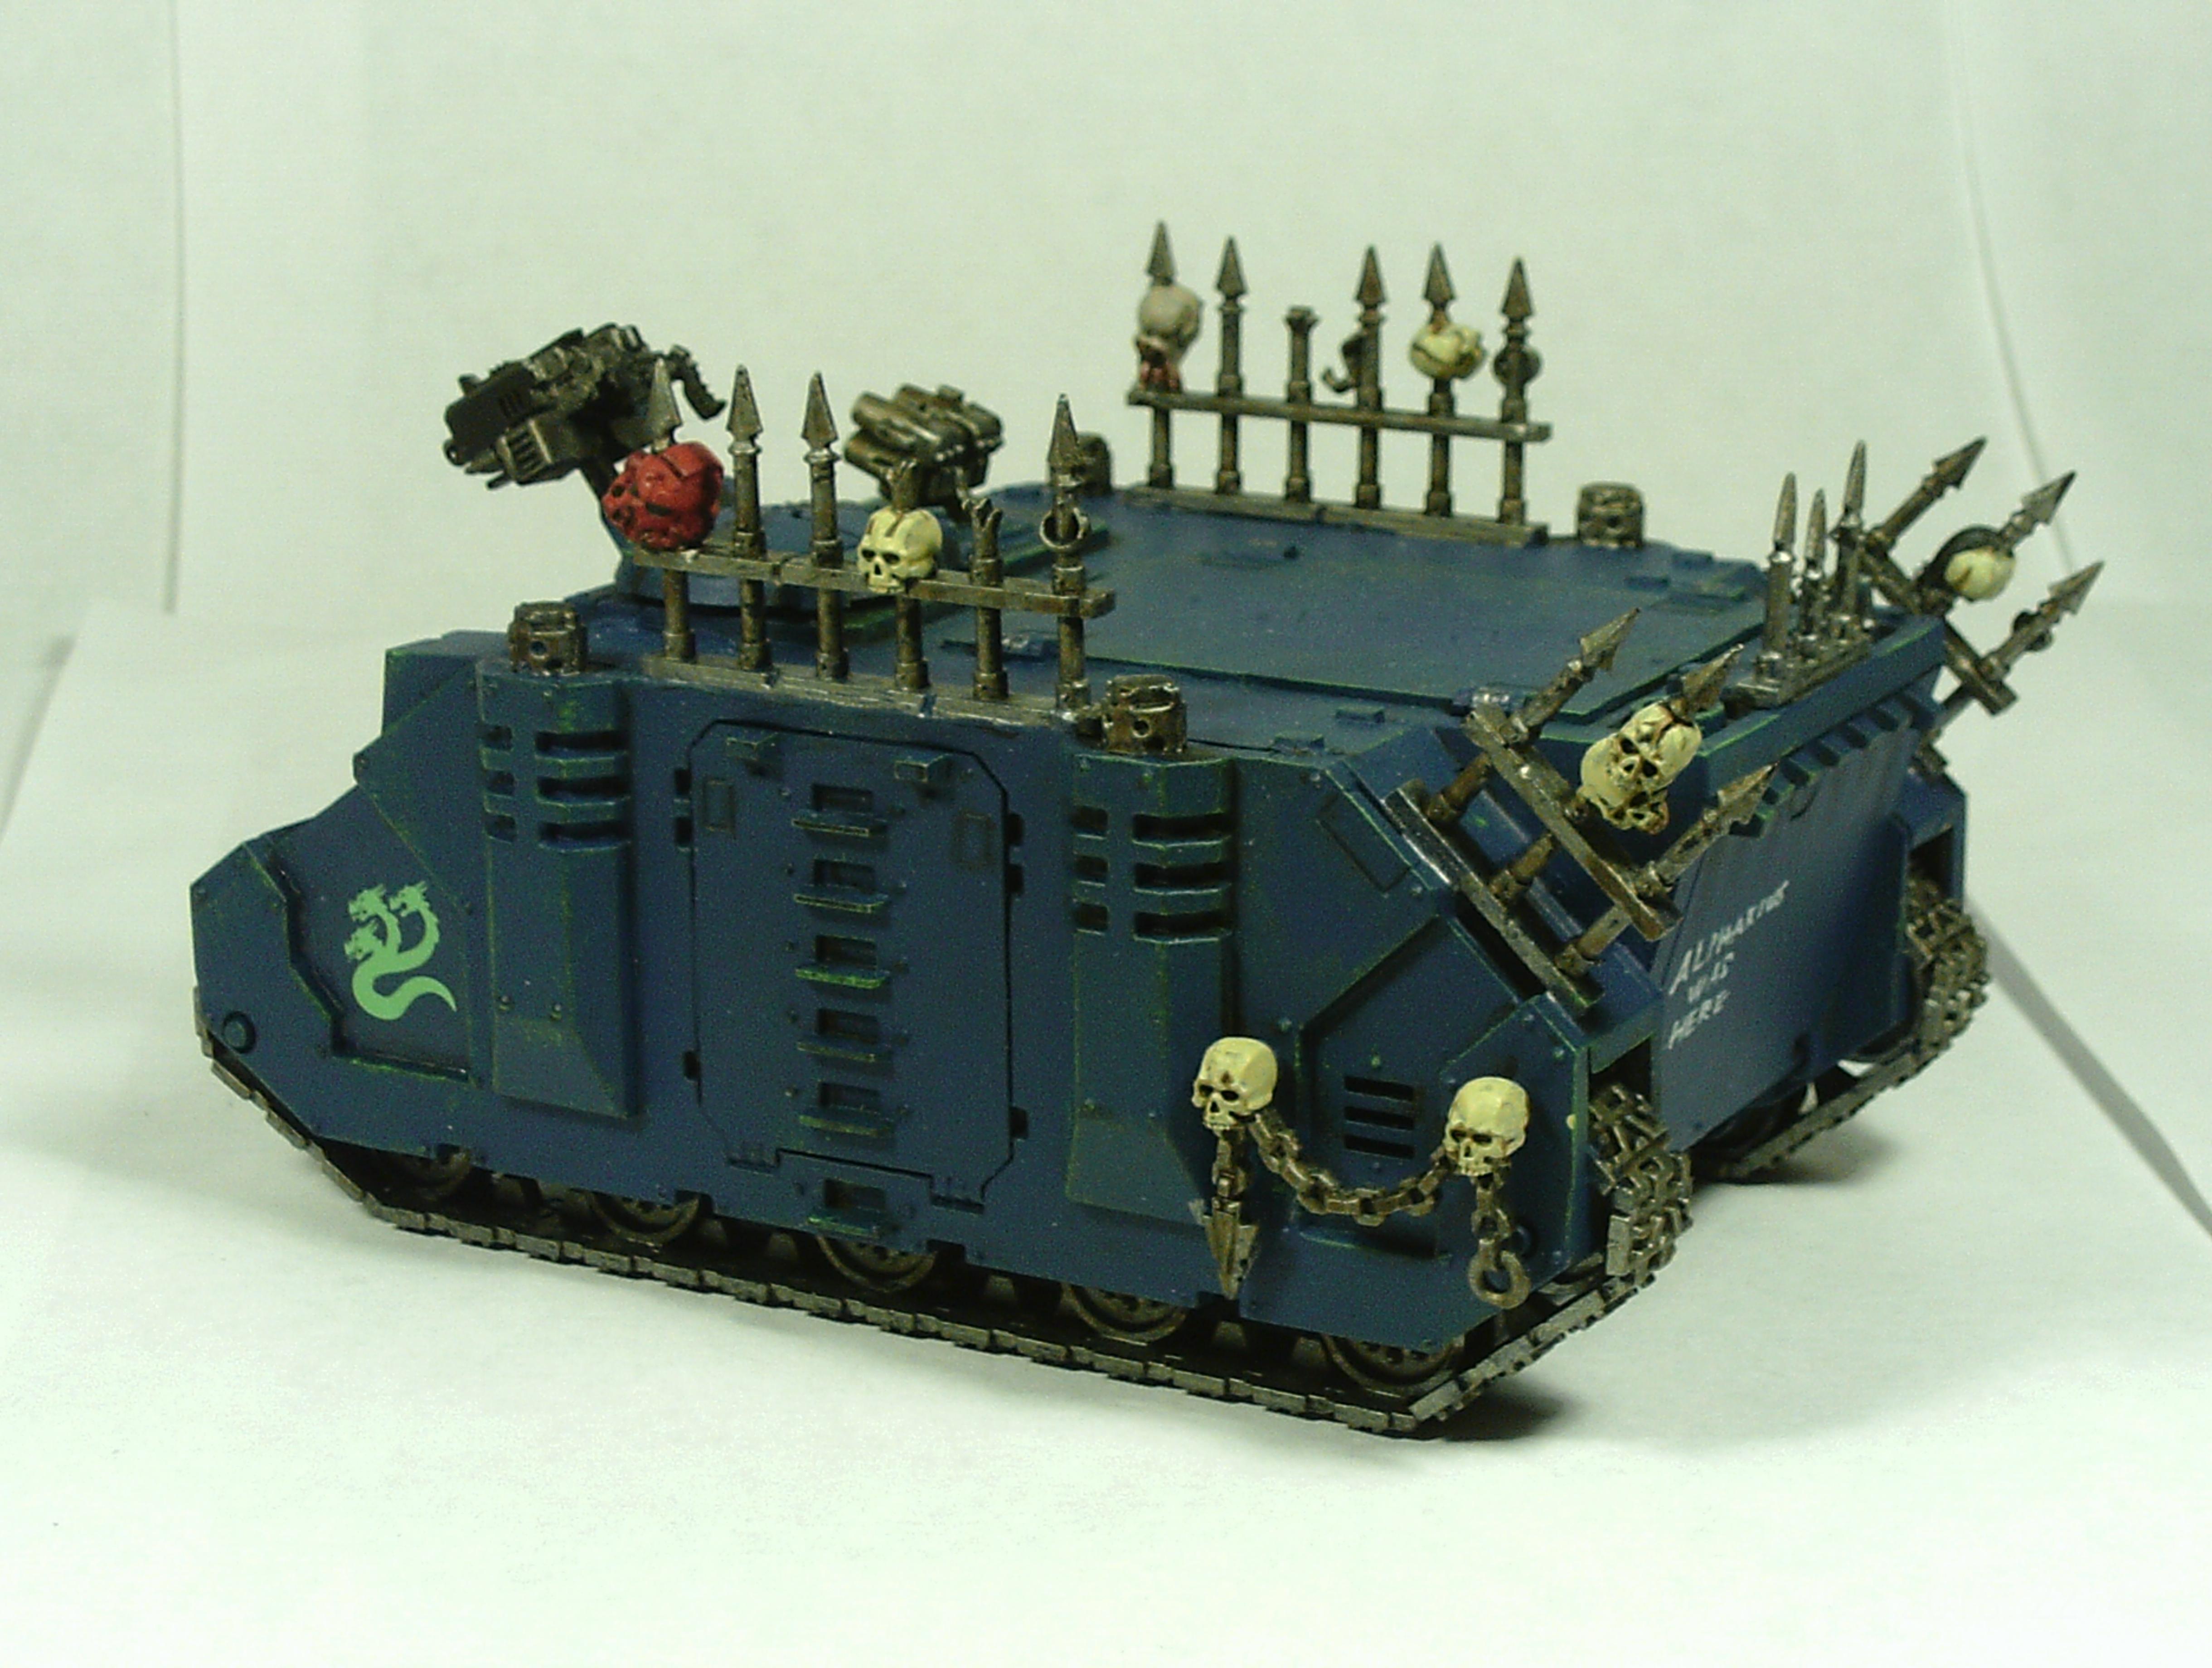 Alpha, Apc, Chaos, Legion, Rhino, Space, Space Marines, Transport, Vehicle